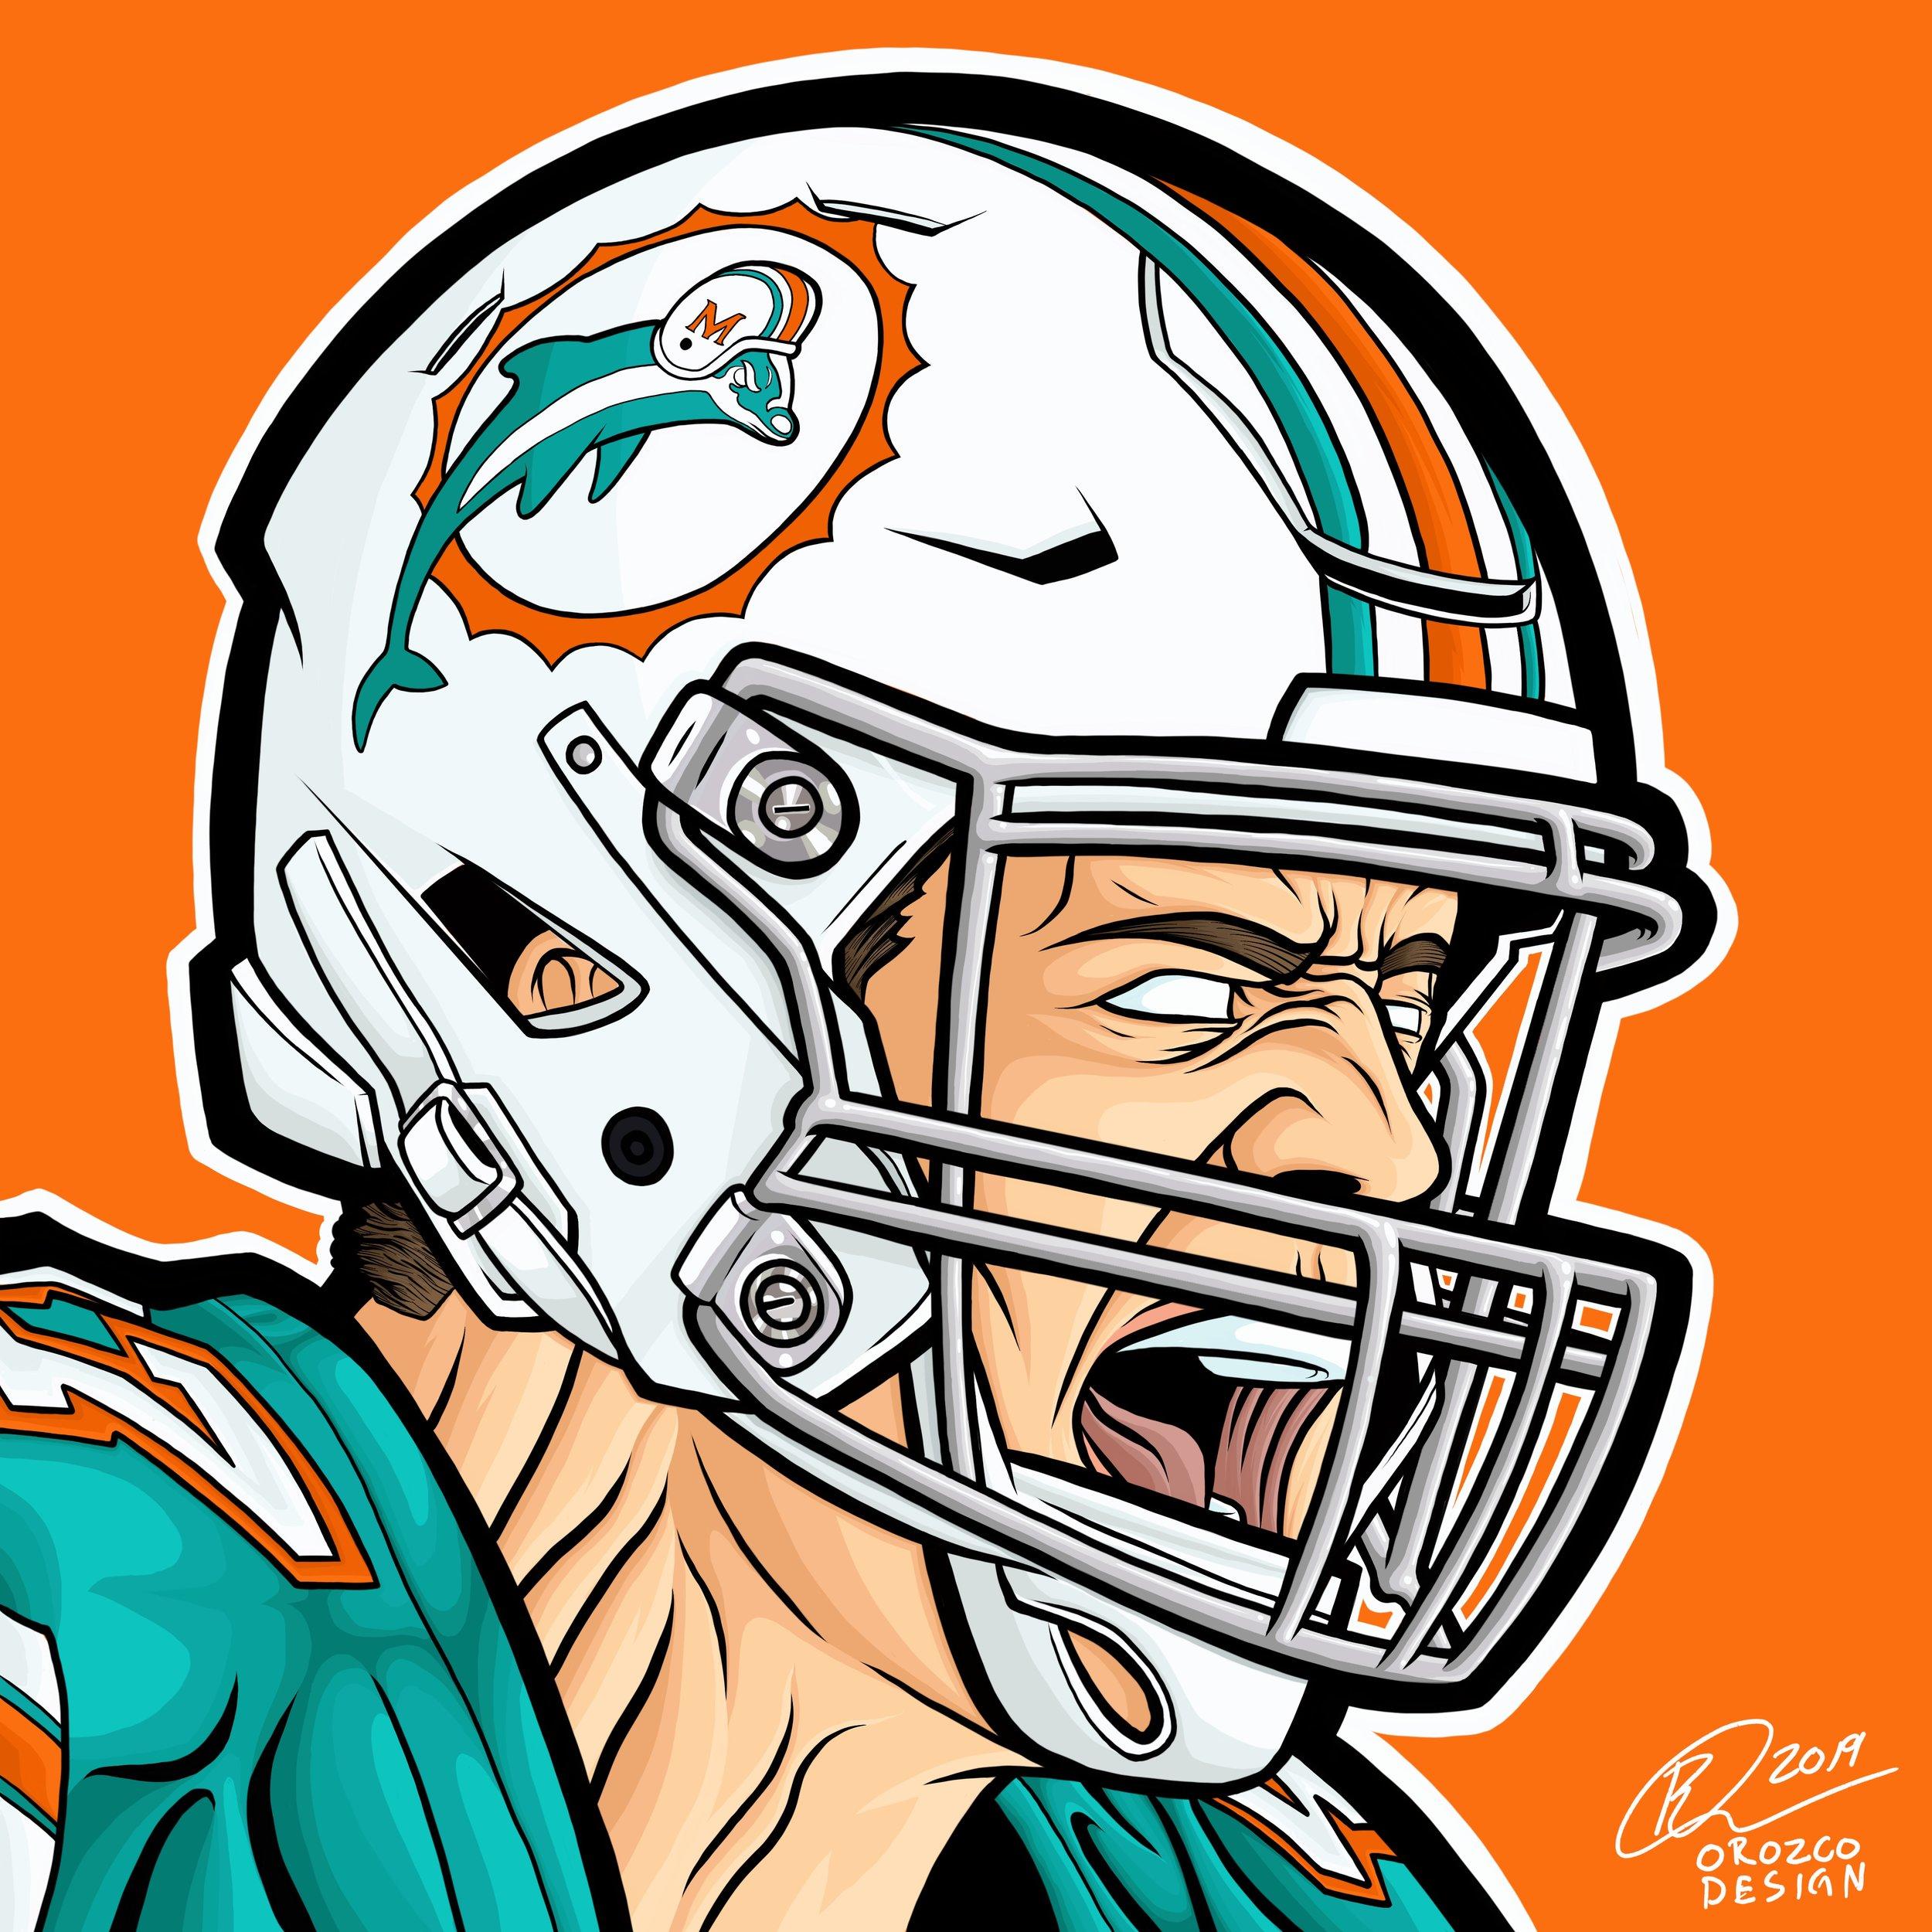 orozcodesign-miamidolphins-NFL-KikoAlonso-illustration .JPG